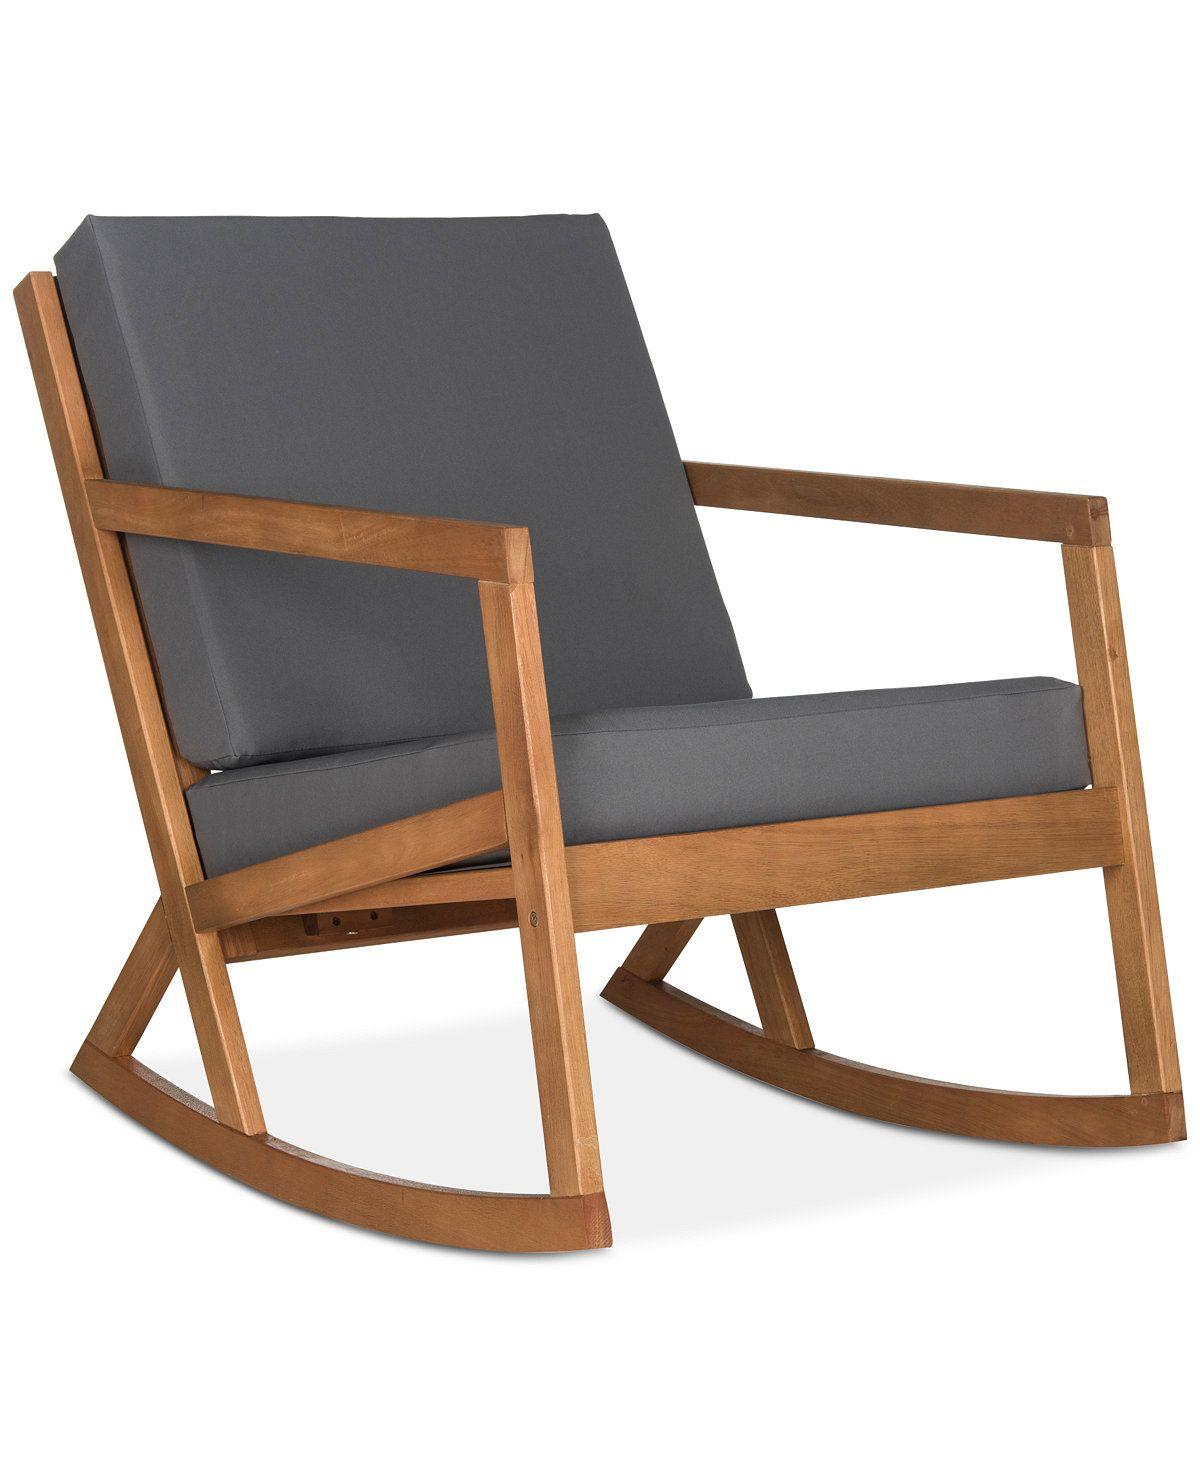 Enjoyable Nicksen Outdoor Rocking Chair Quick Ship Wishlist Short Links Chair Design For Home Short Linksinfo